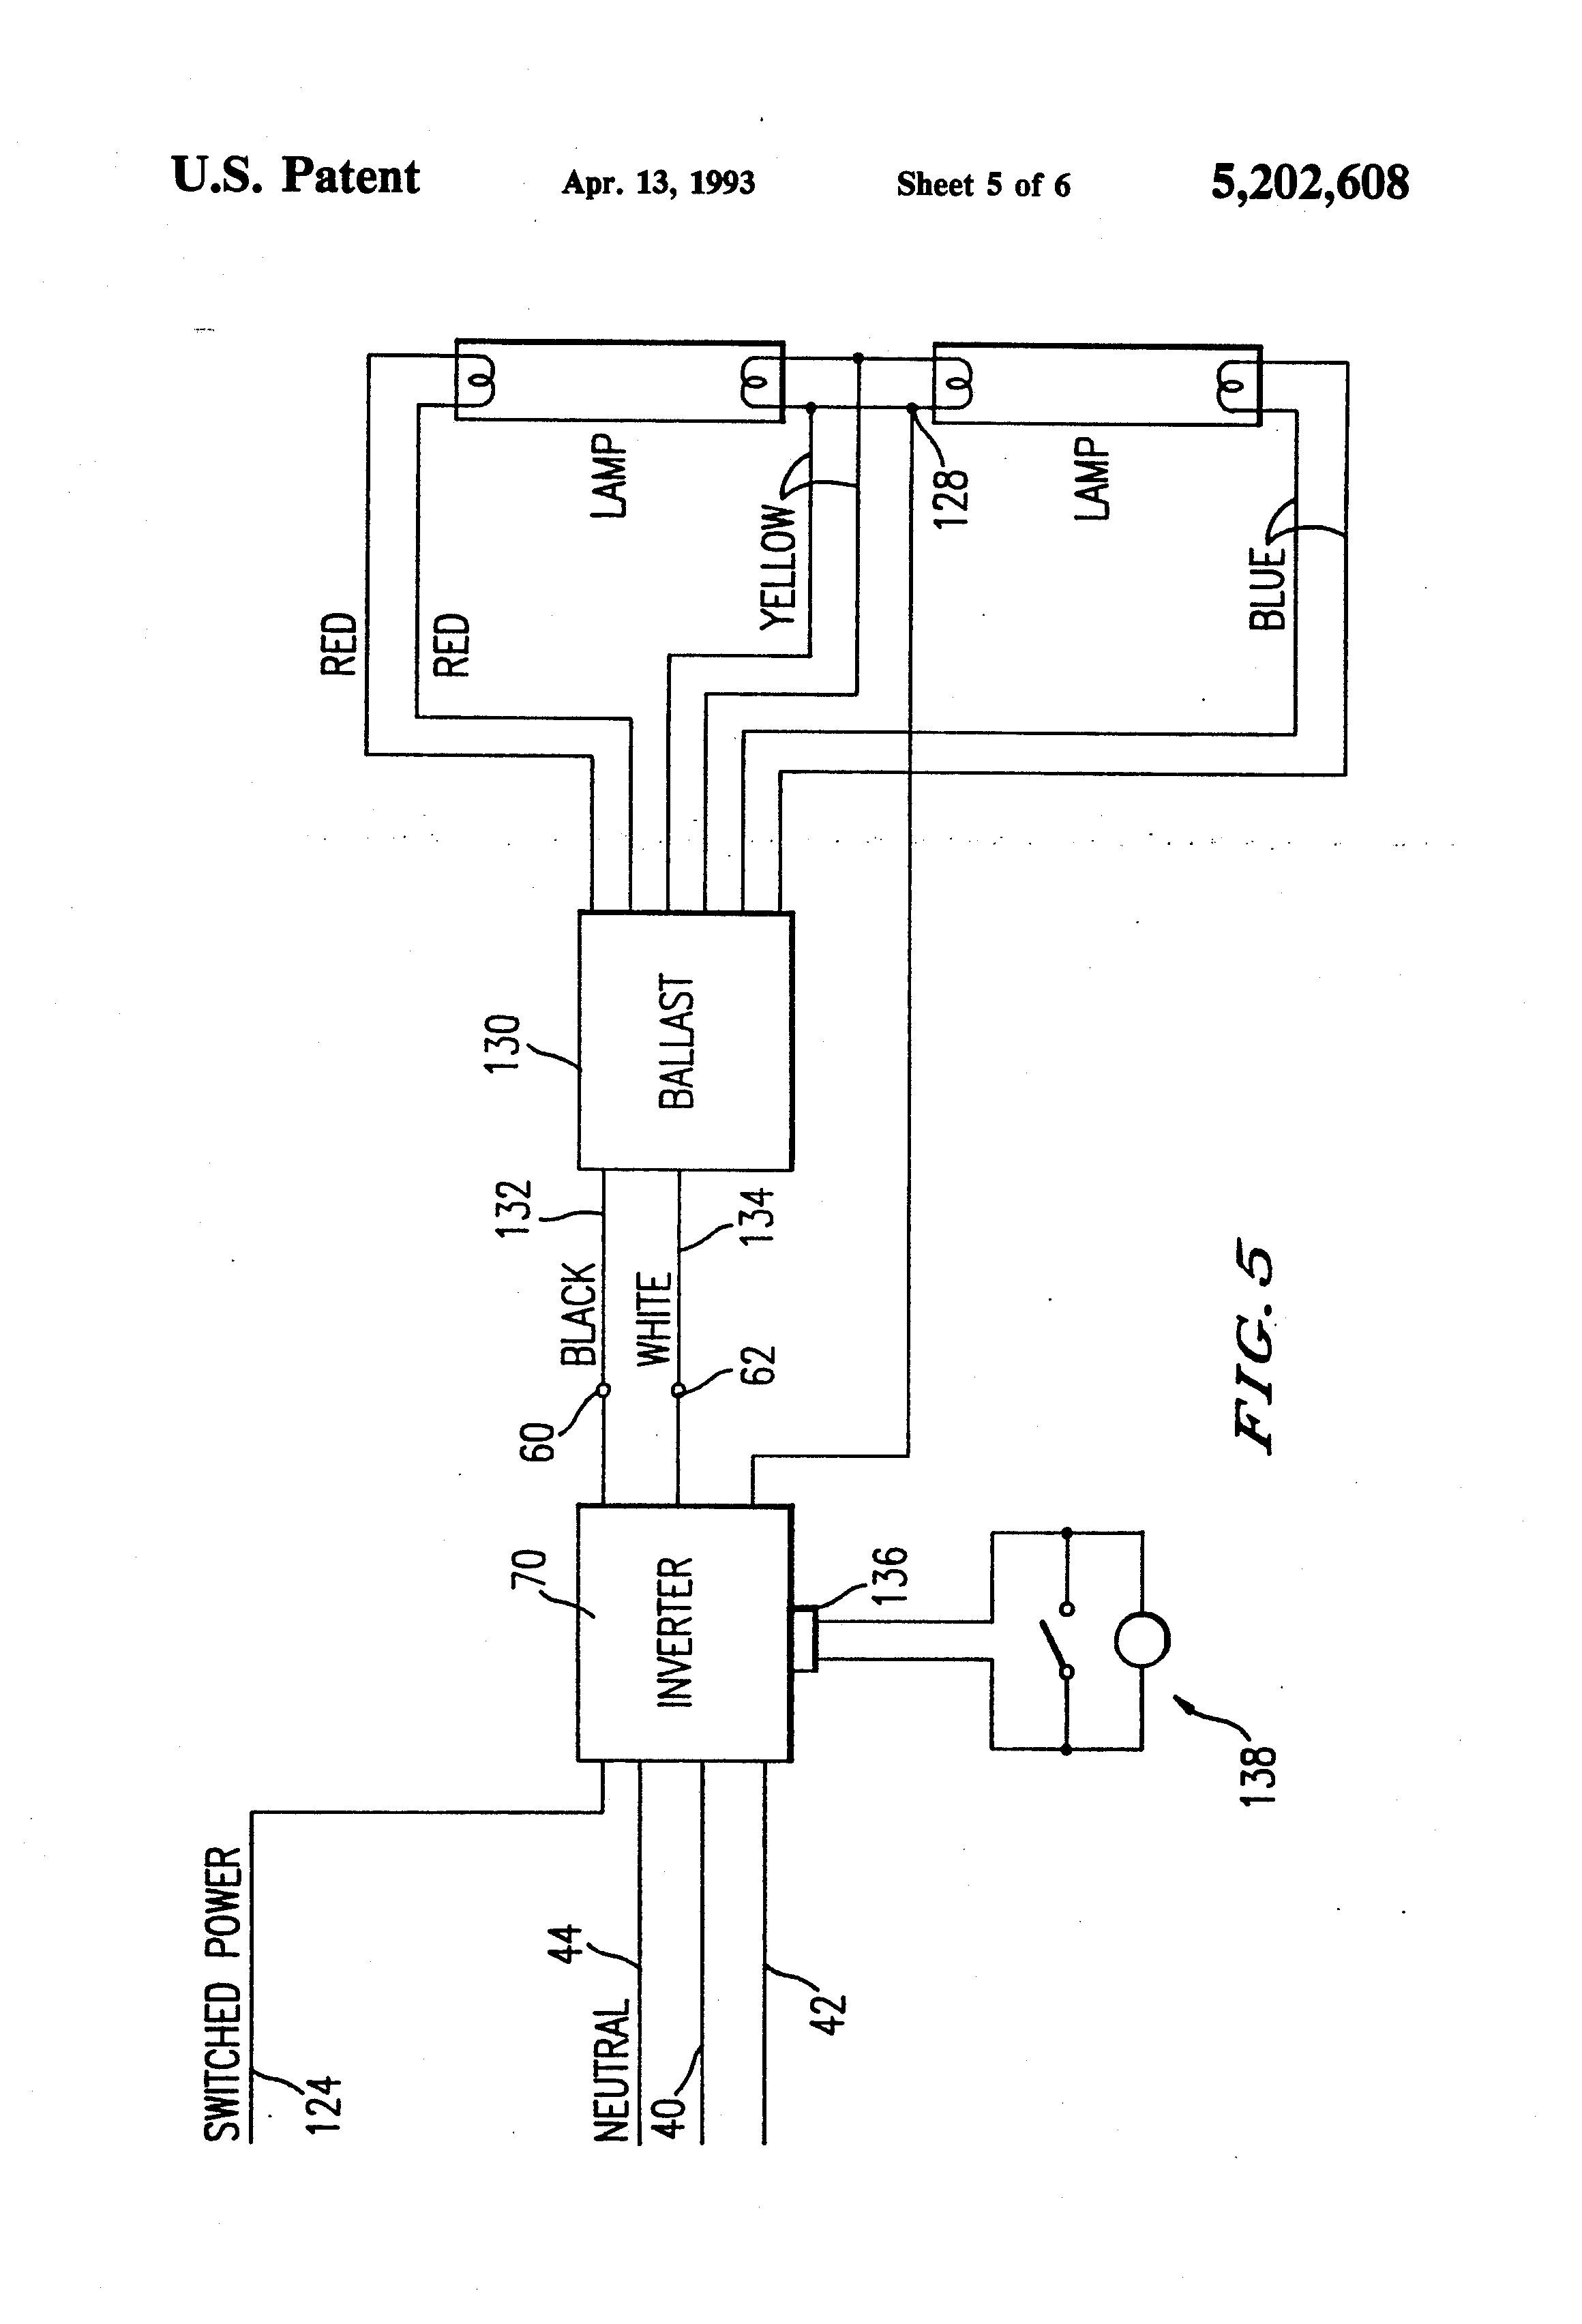 4 Lamp T5ho Wiring Diagram Centium Ballasts - Wiring Diagram ...  Lamp T Ballast Wiring Diagram on